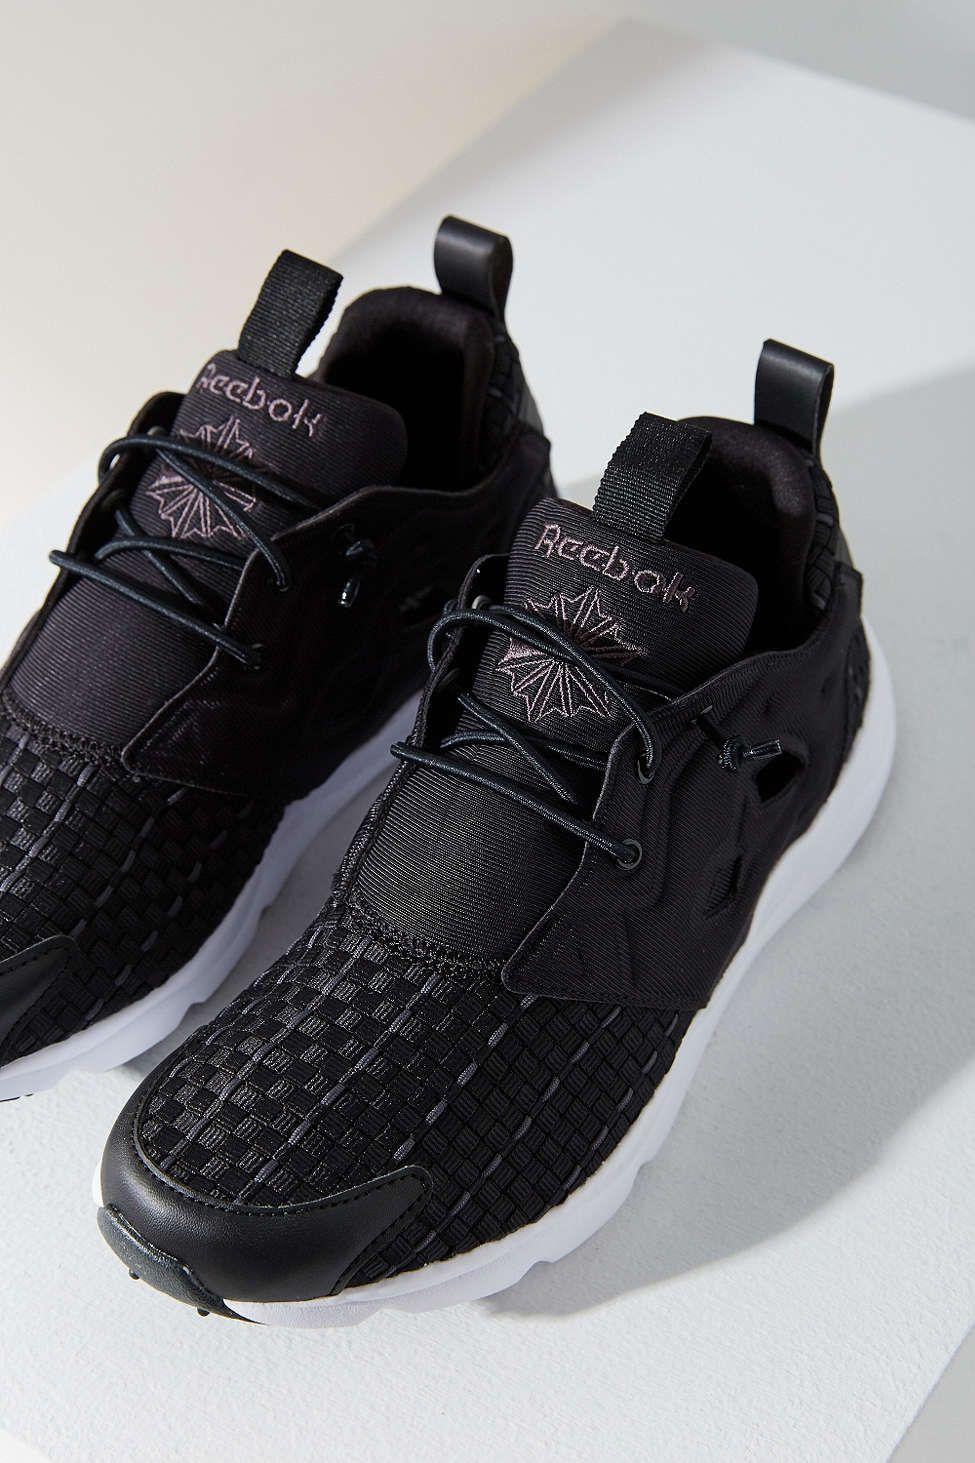 6f48a8e2f28f3d ... Reebok Furylite New Woven Sneaker ...